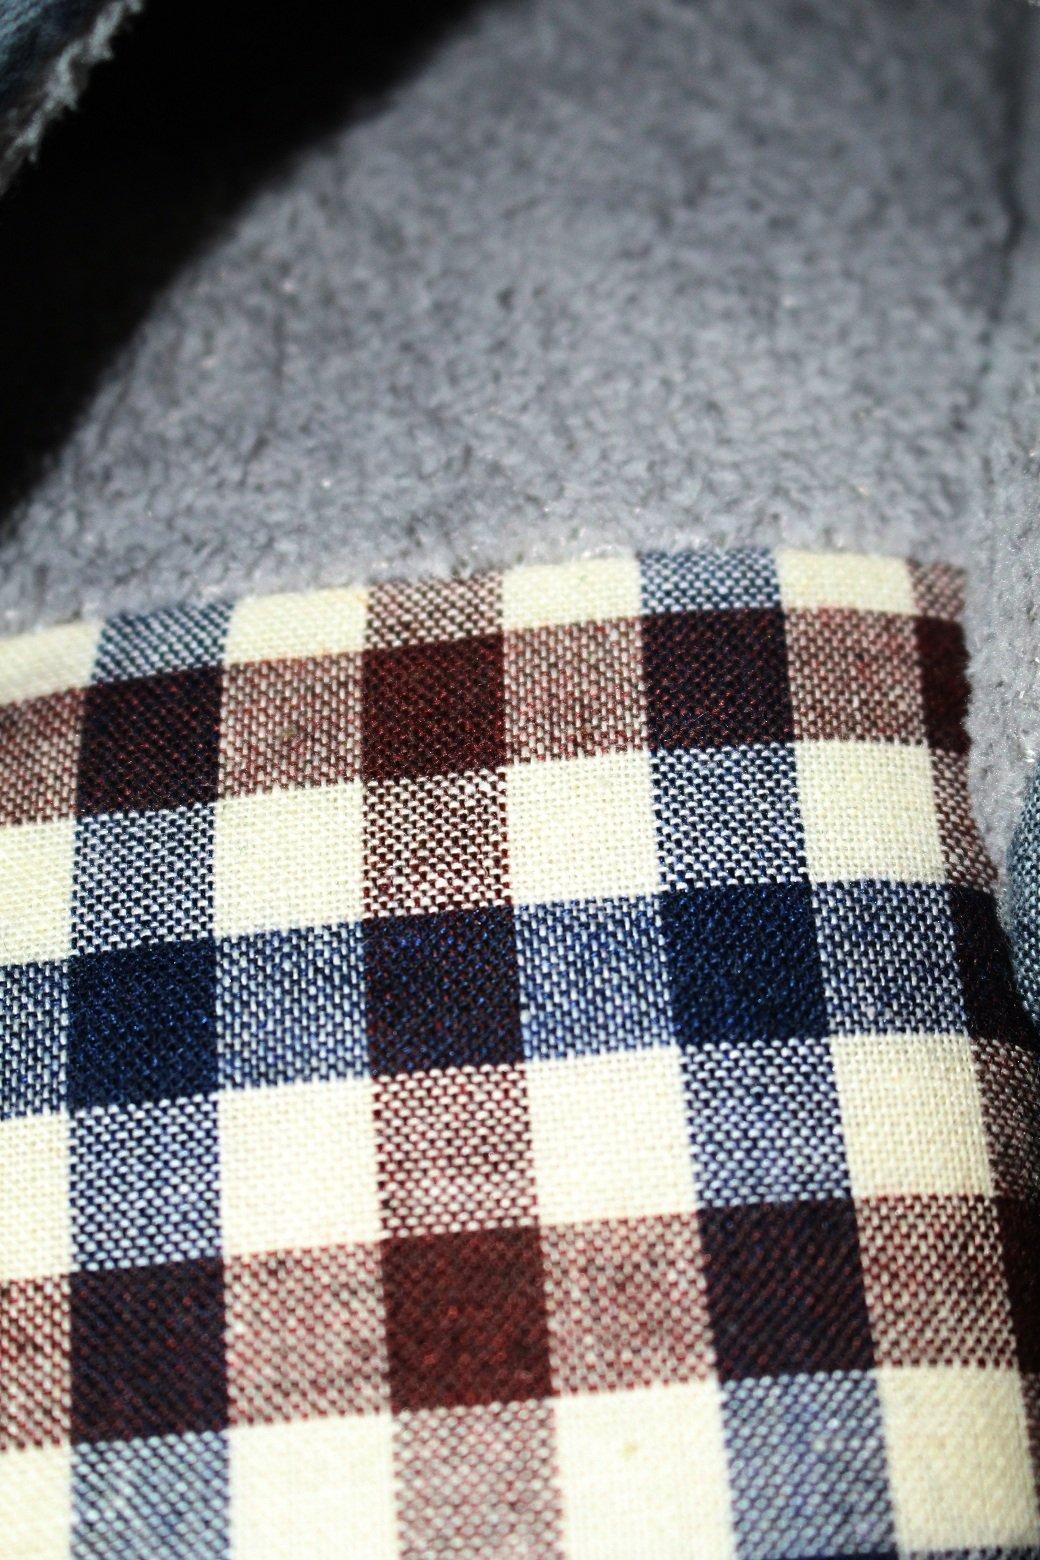 EURO SKY Stylish Cotton Grids Scalloped Clog Antiskid House Slippers Navy -Size: US 11/EU (44/45) by EURO SKY (Image #3)